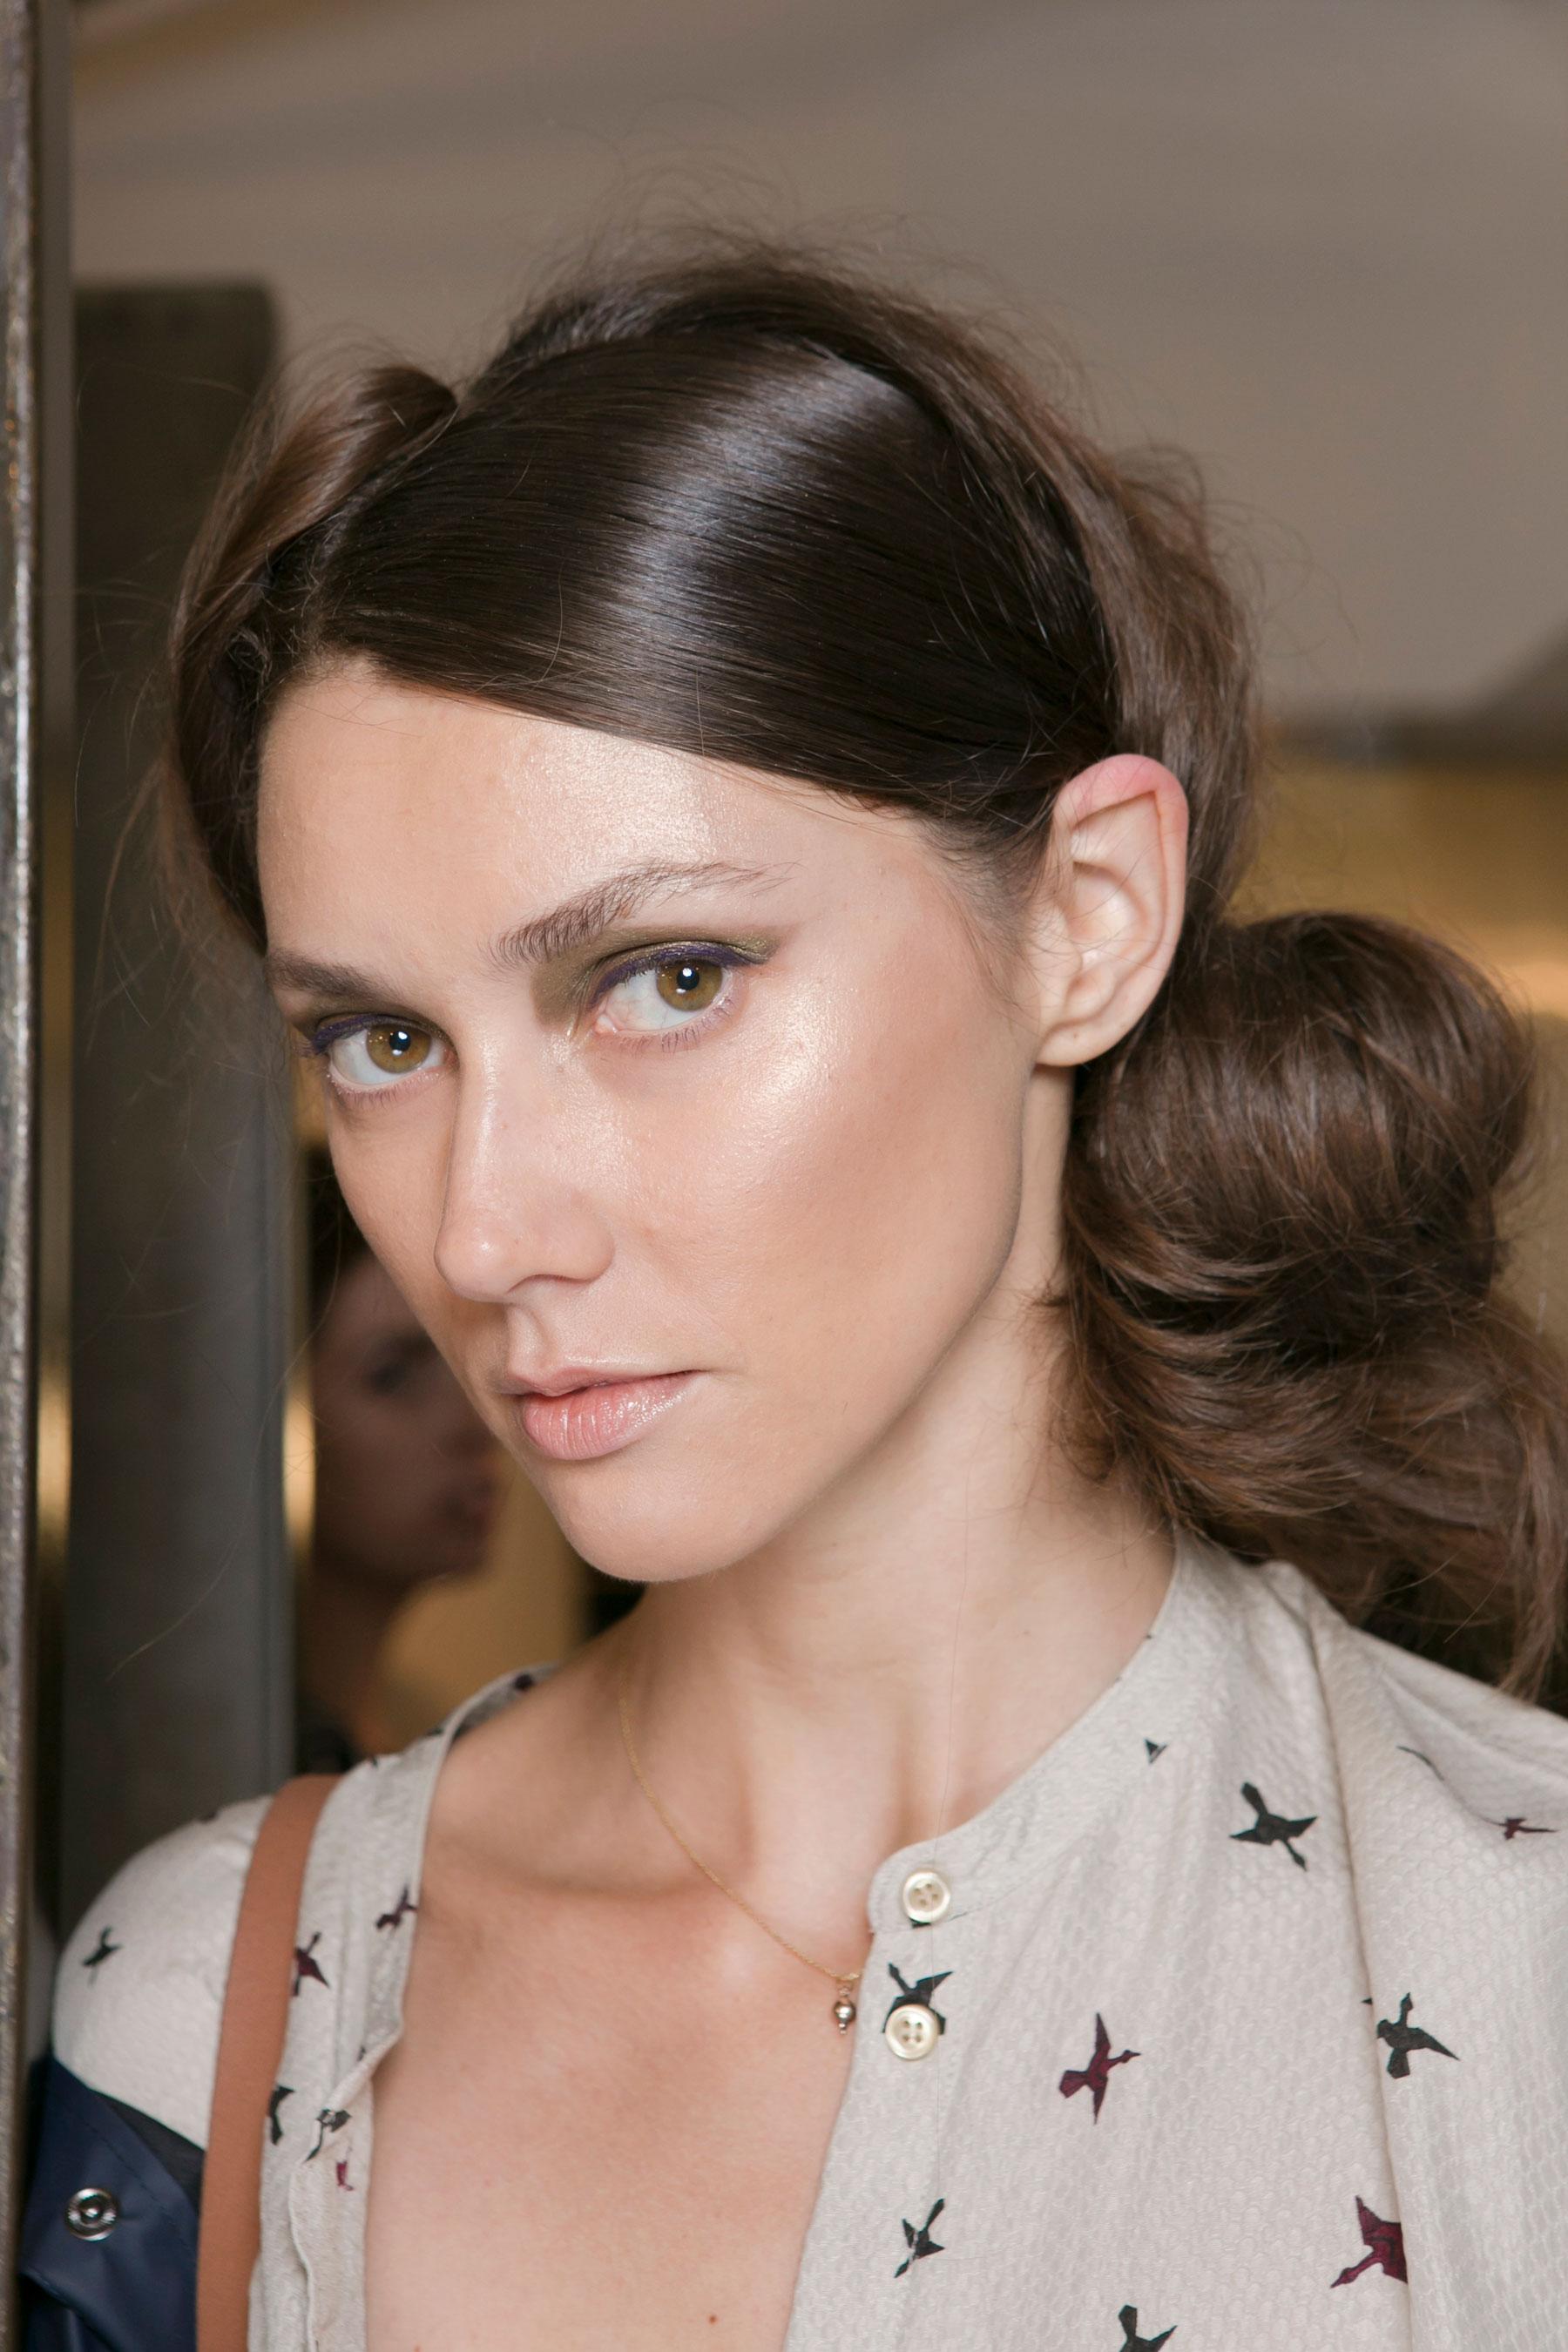 marissa-webb-beauty--spring-2016-fashion-show-the-impression-19